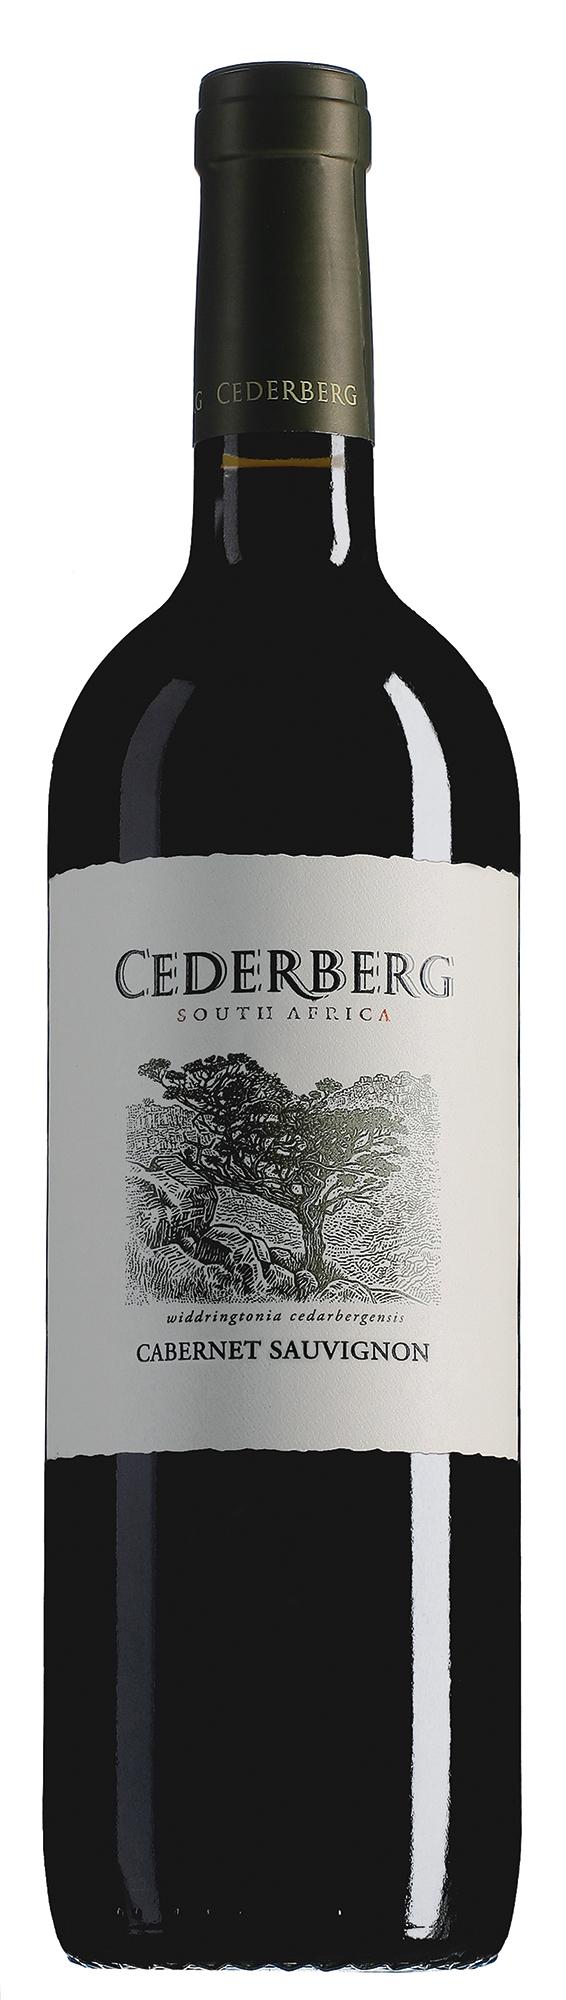 Cederberg Cabernet Sauvignon